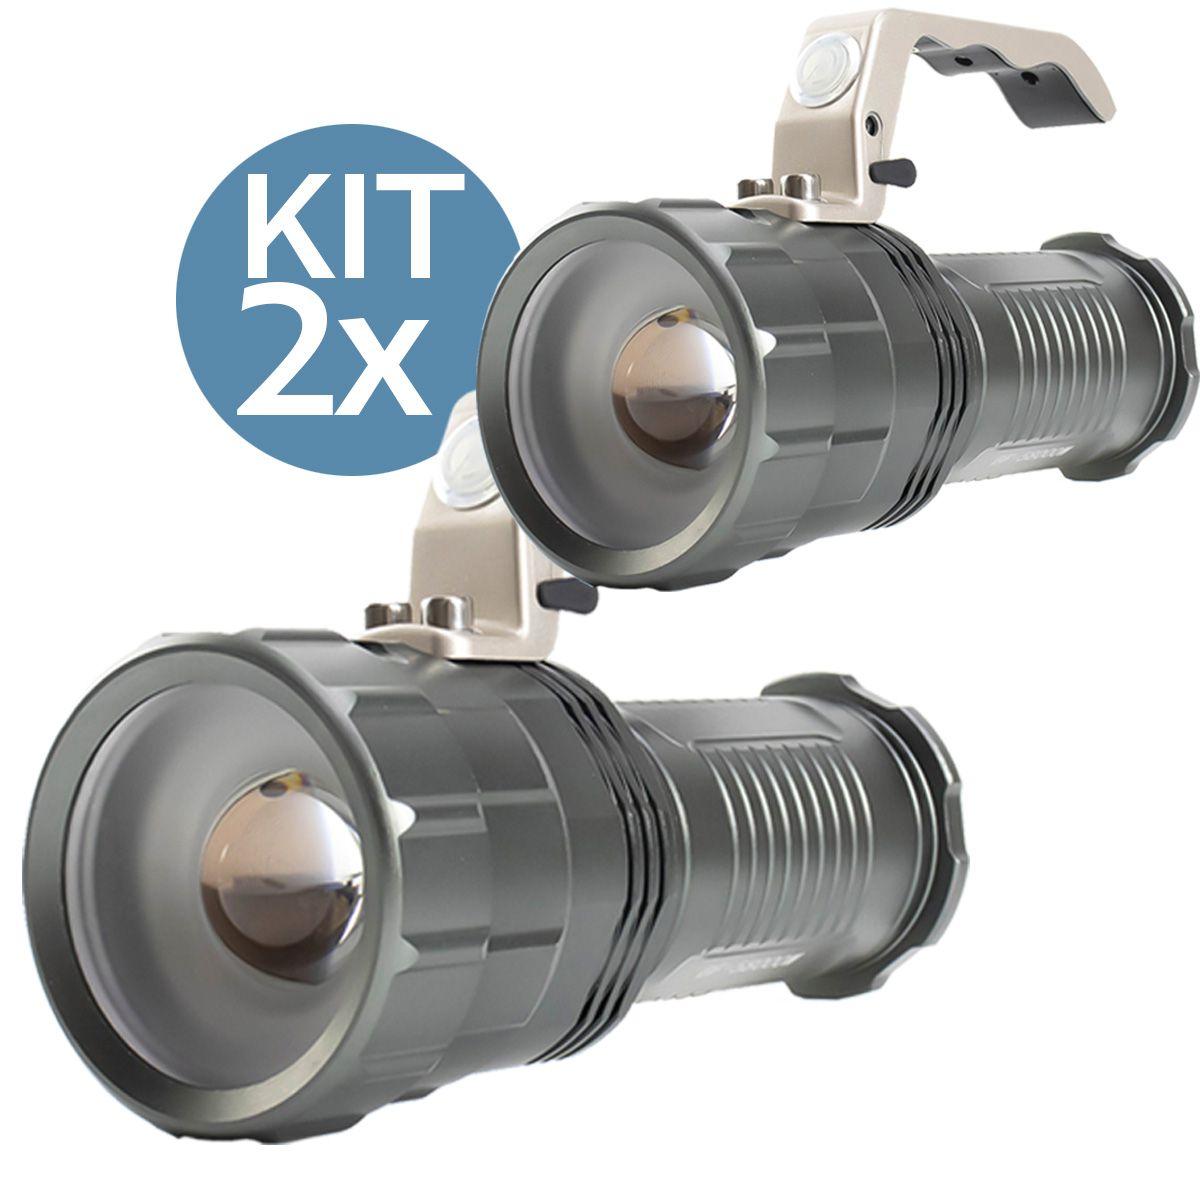 KIT 2x Lanterna Led Recarregável de 1200 Lumens B-Max BM-8806